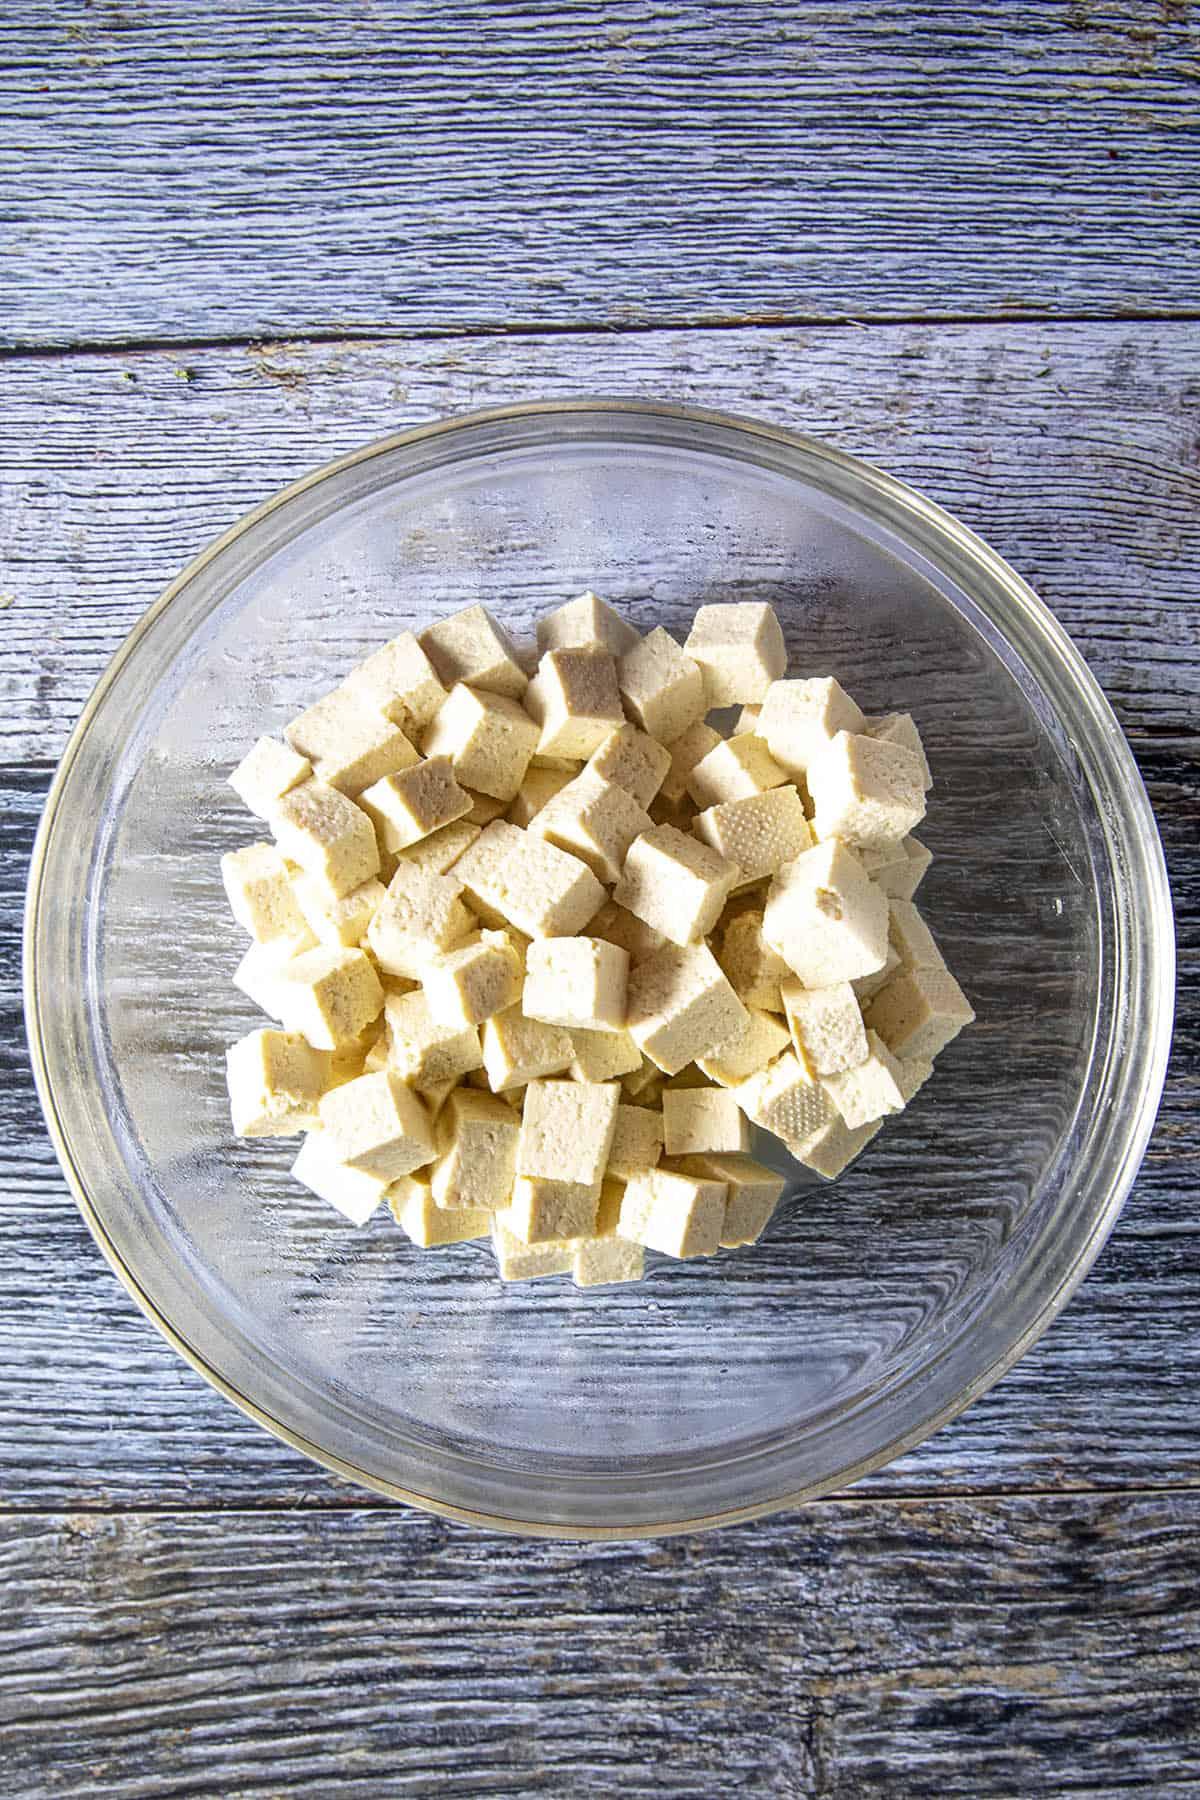 Cubed tofu for making Mapo Tofu